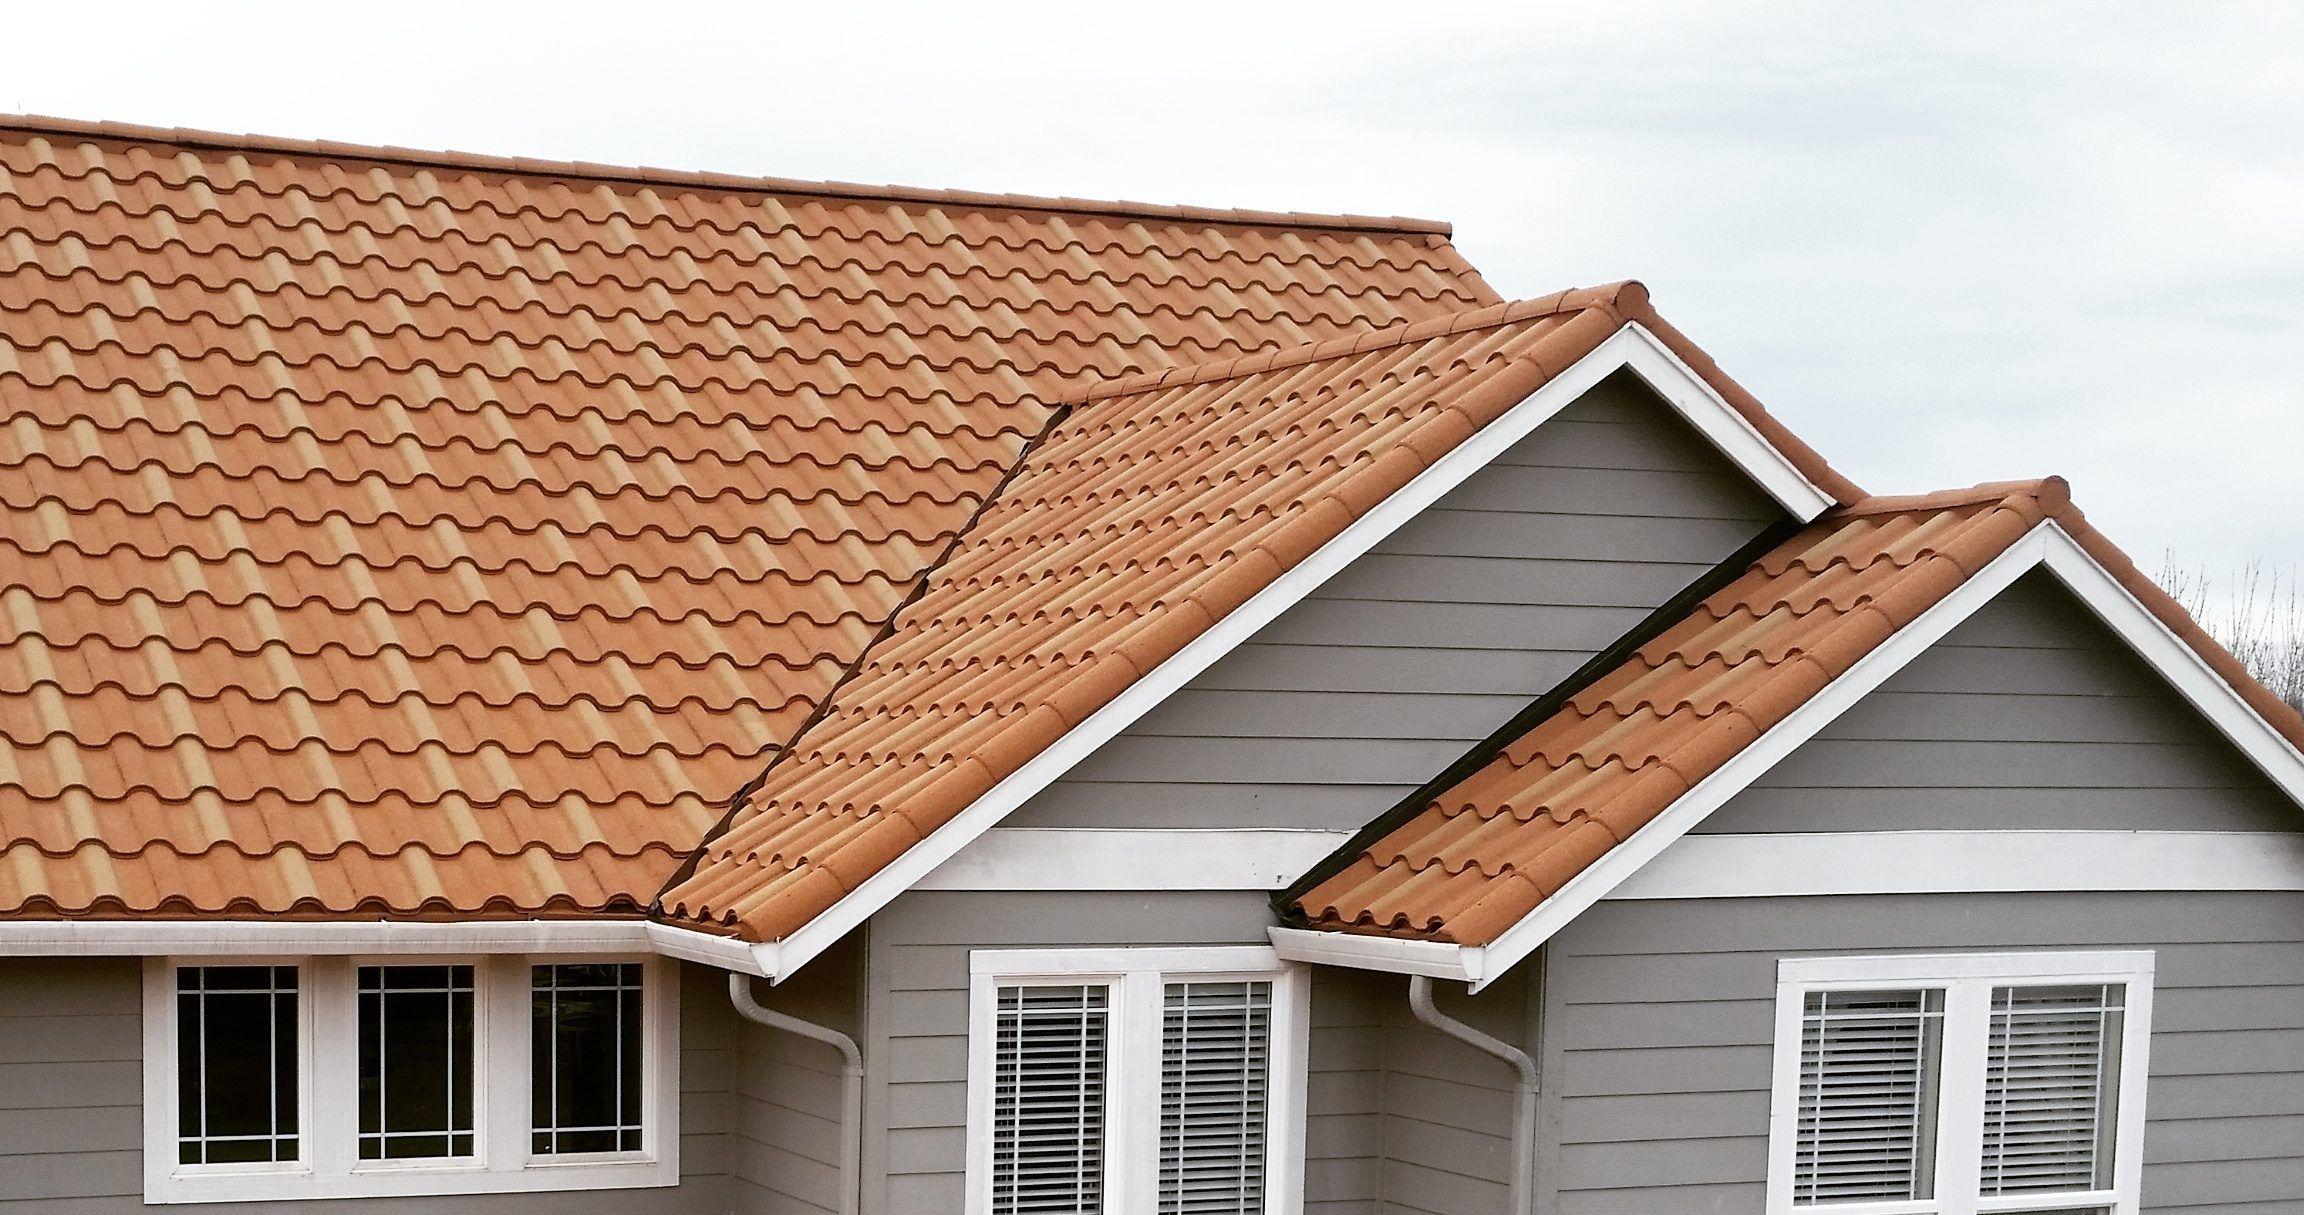 decra-metal-tile-villa-roof-install-vancouver-washington-e15